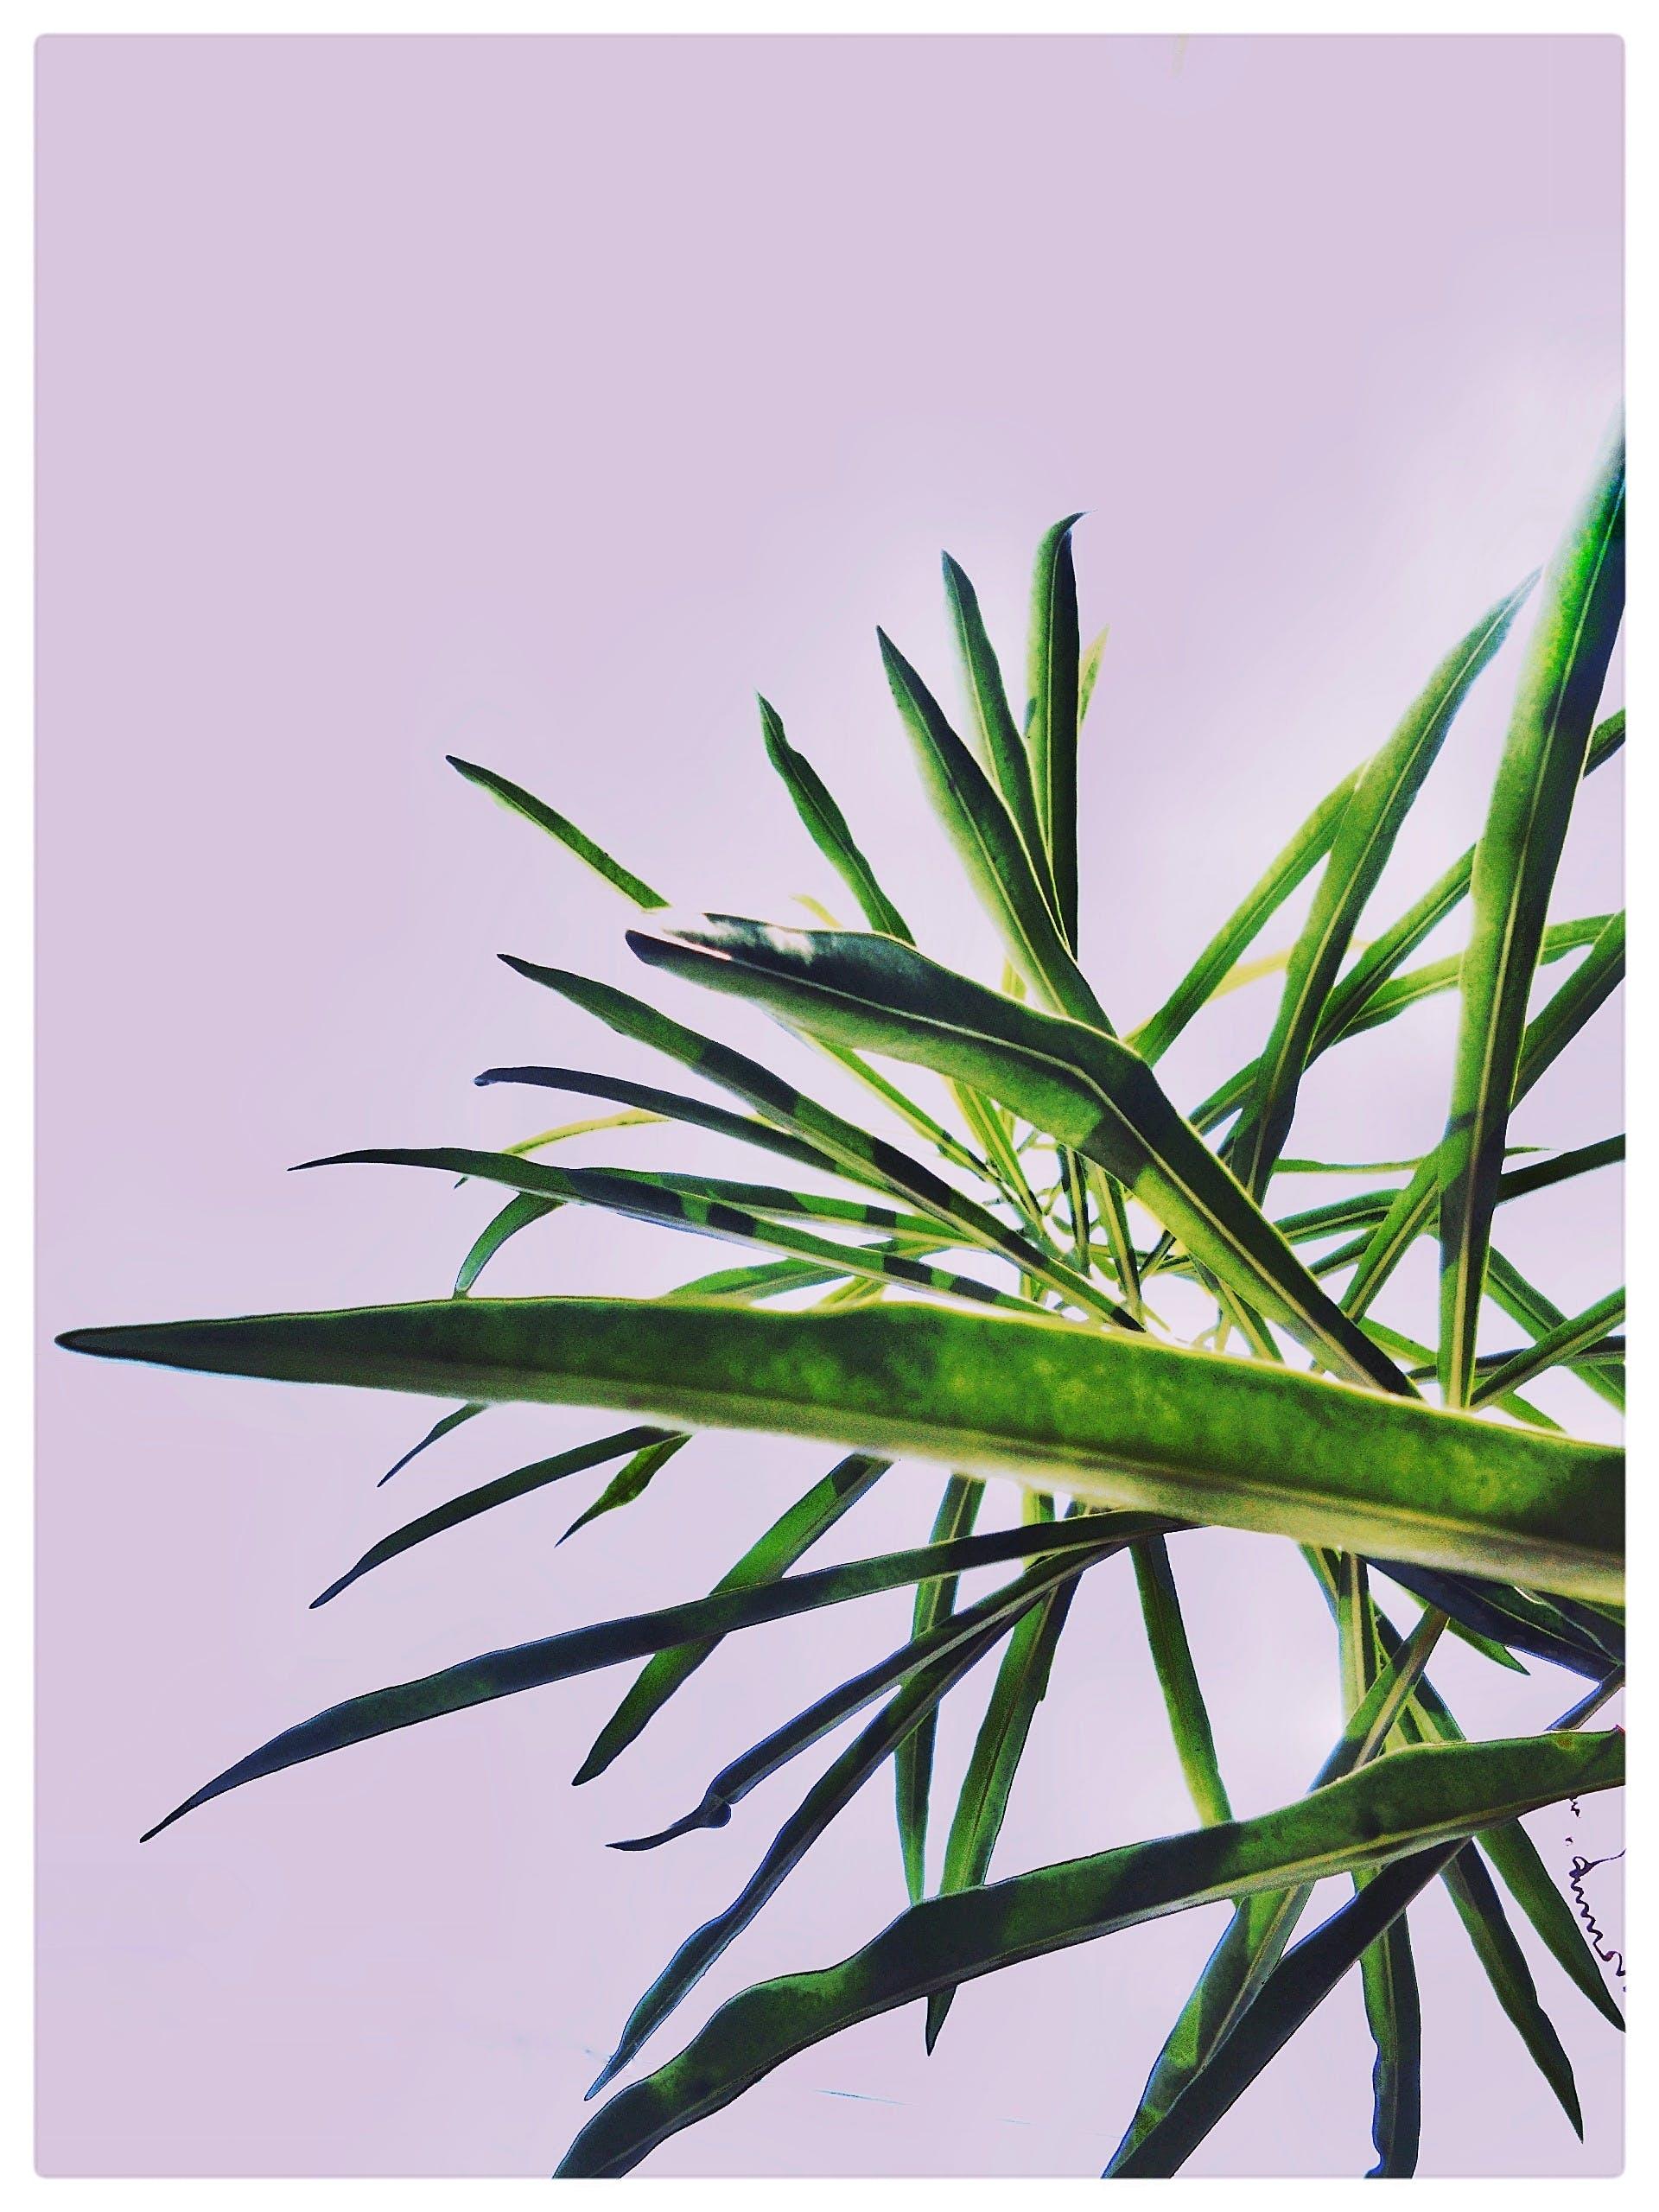 Linear Green-leafed Plants Near Wall